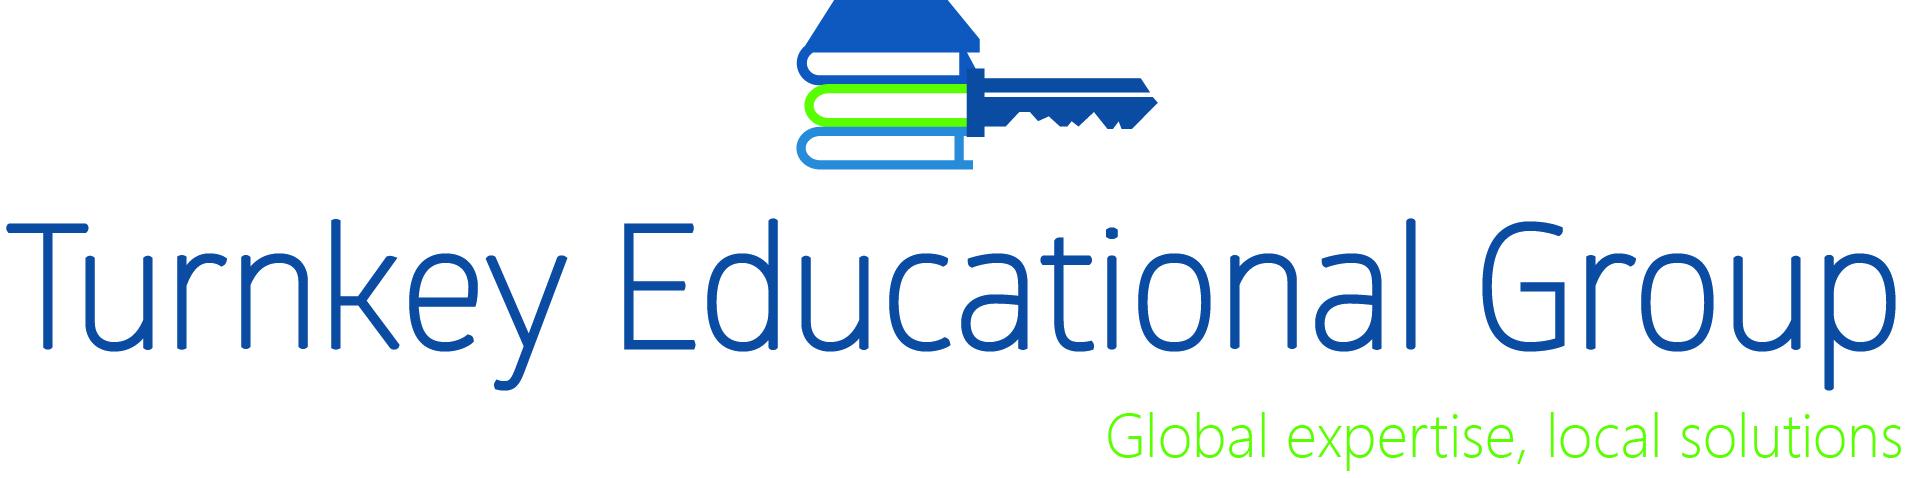 TEG blue + green logo.jpg